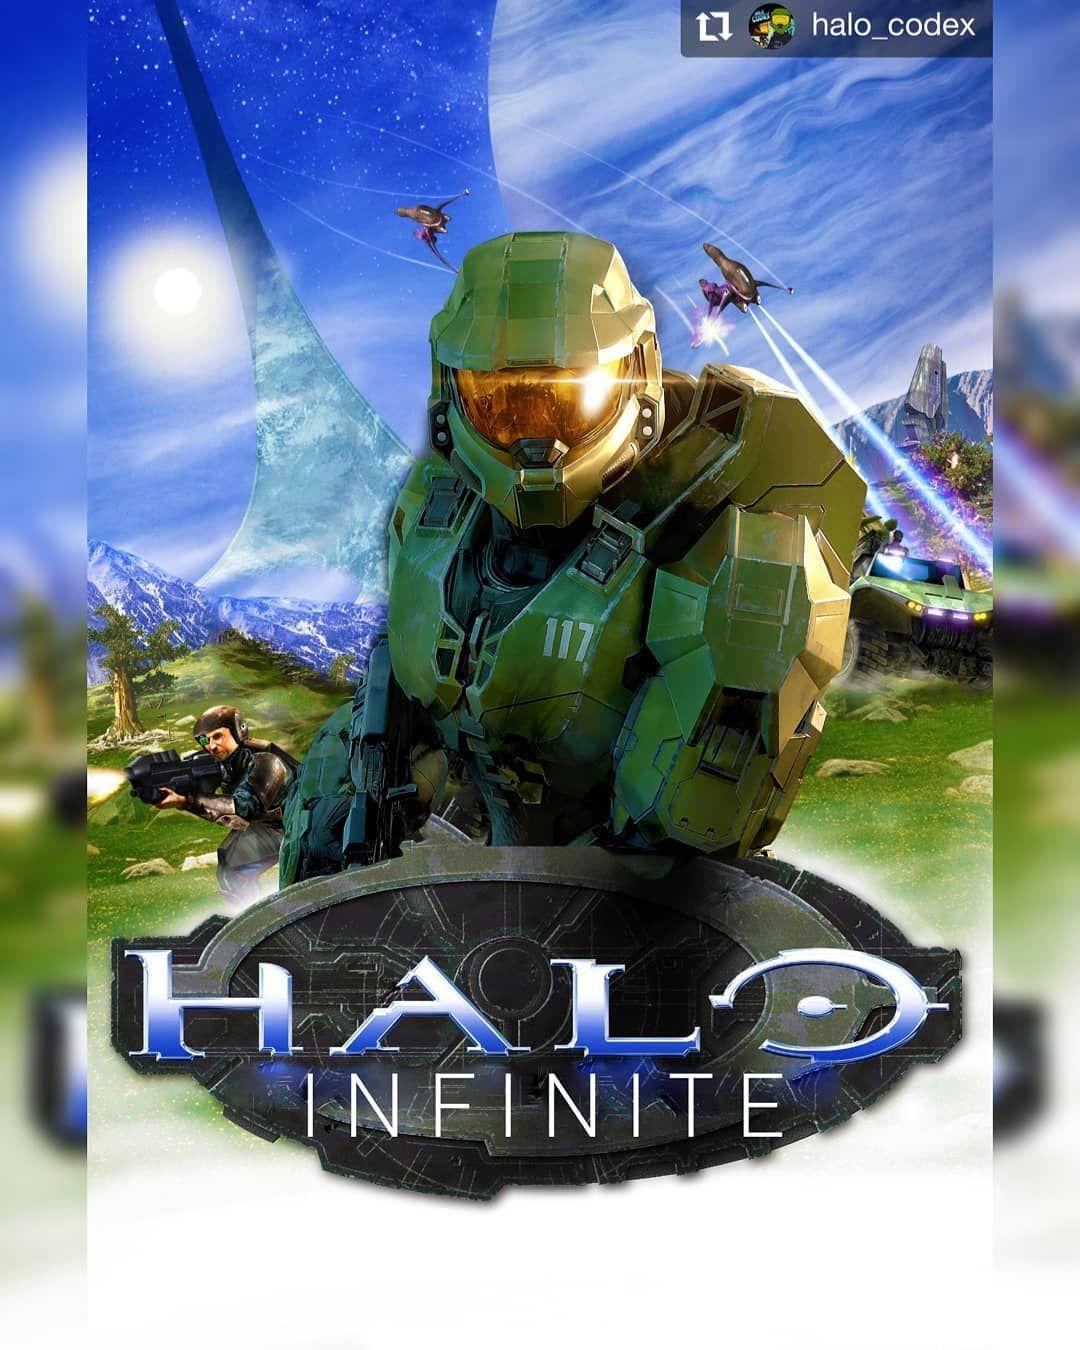 Mordecai Sanchez On Instagram Repost Halo Codex Halo Infinite Box Art But Halo Ce Styled In 2020 Box Art Instagram Halo Ce